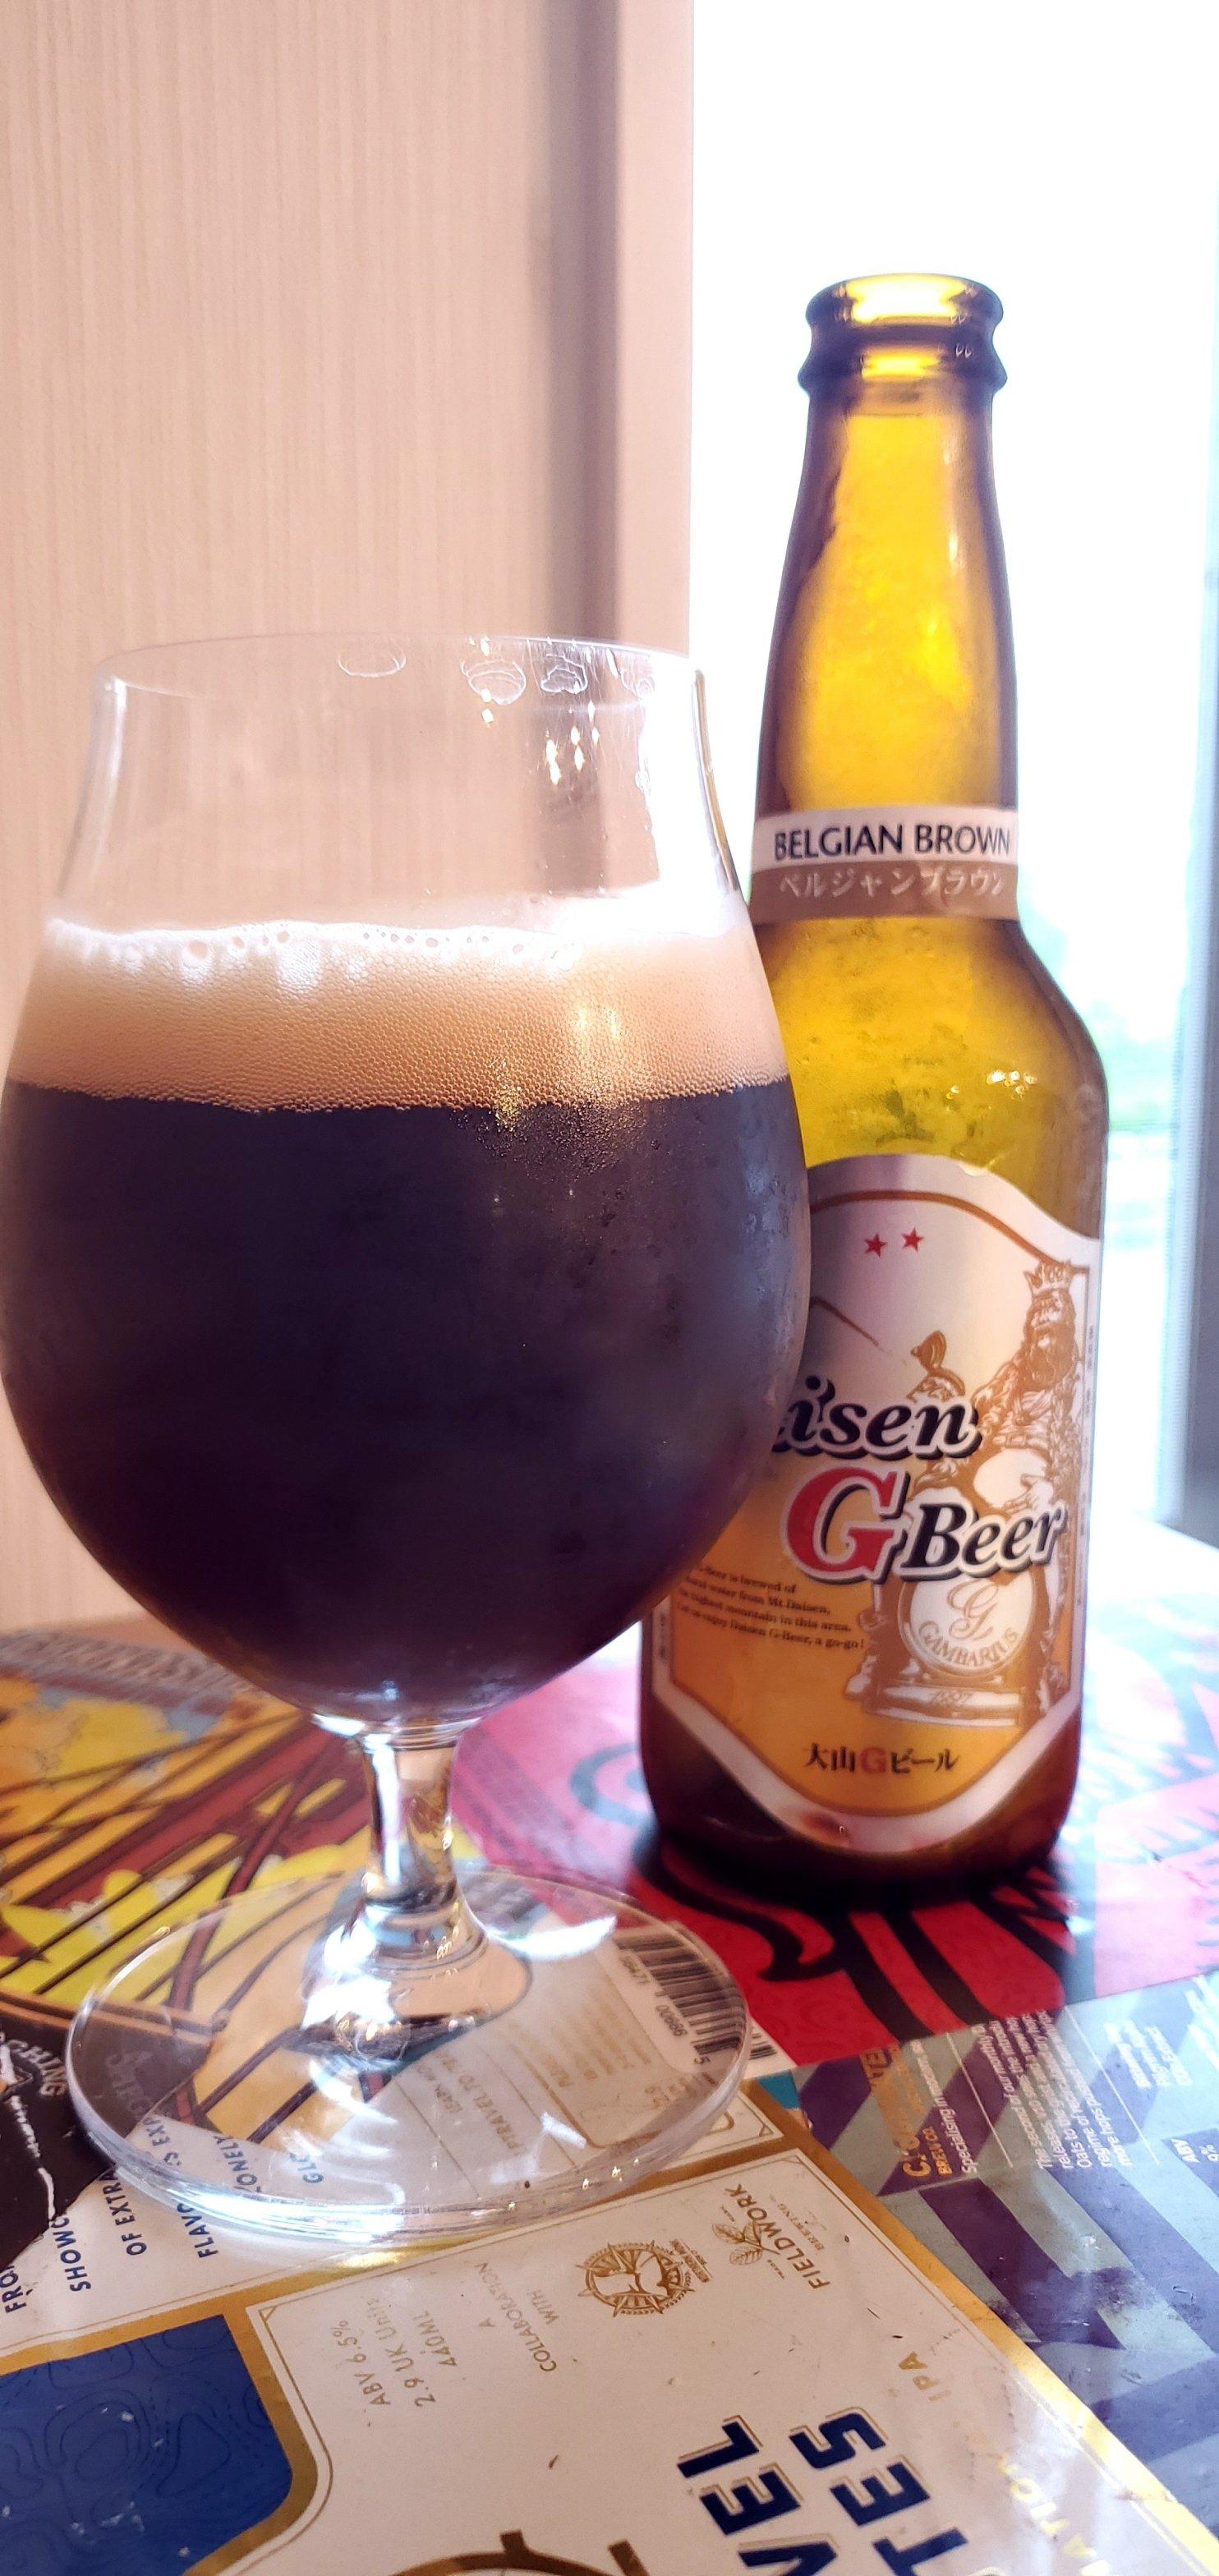 Daisen G Belgian Brown・大山Gベルジャンブラウン